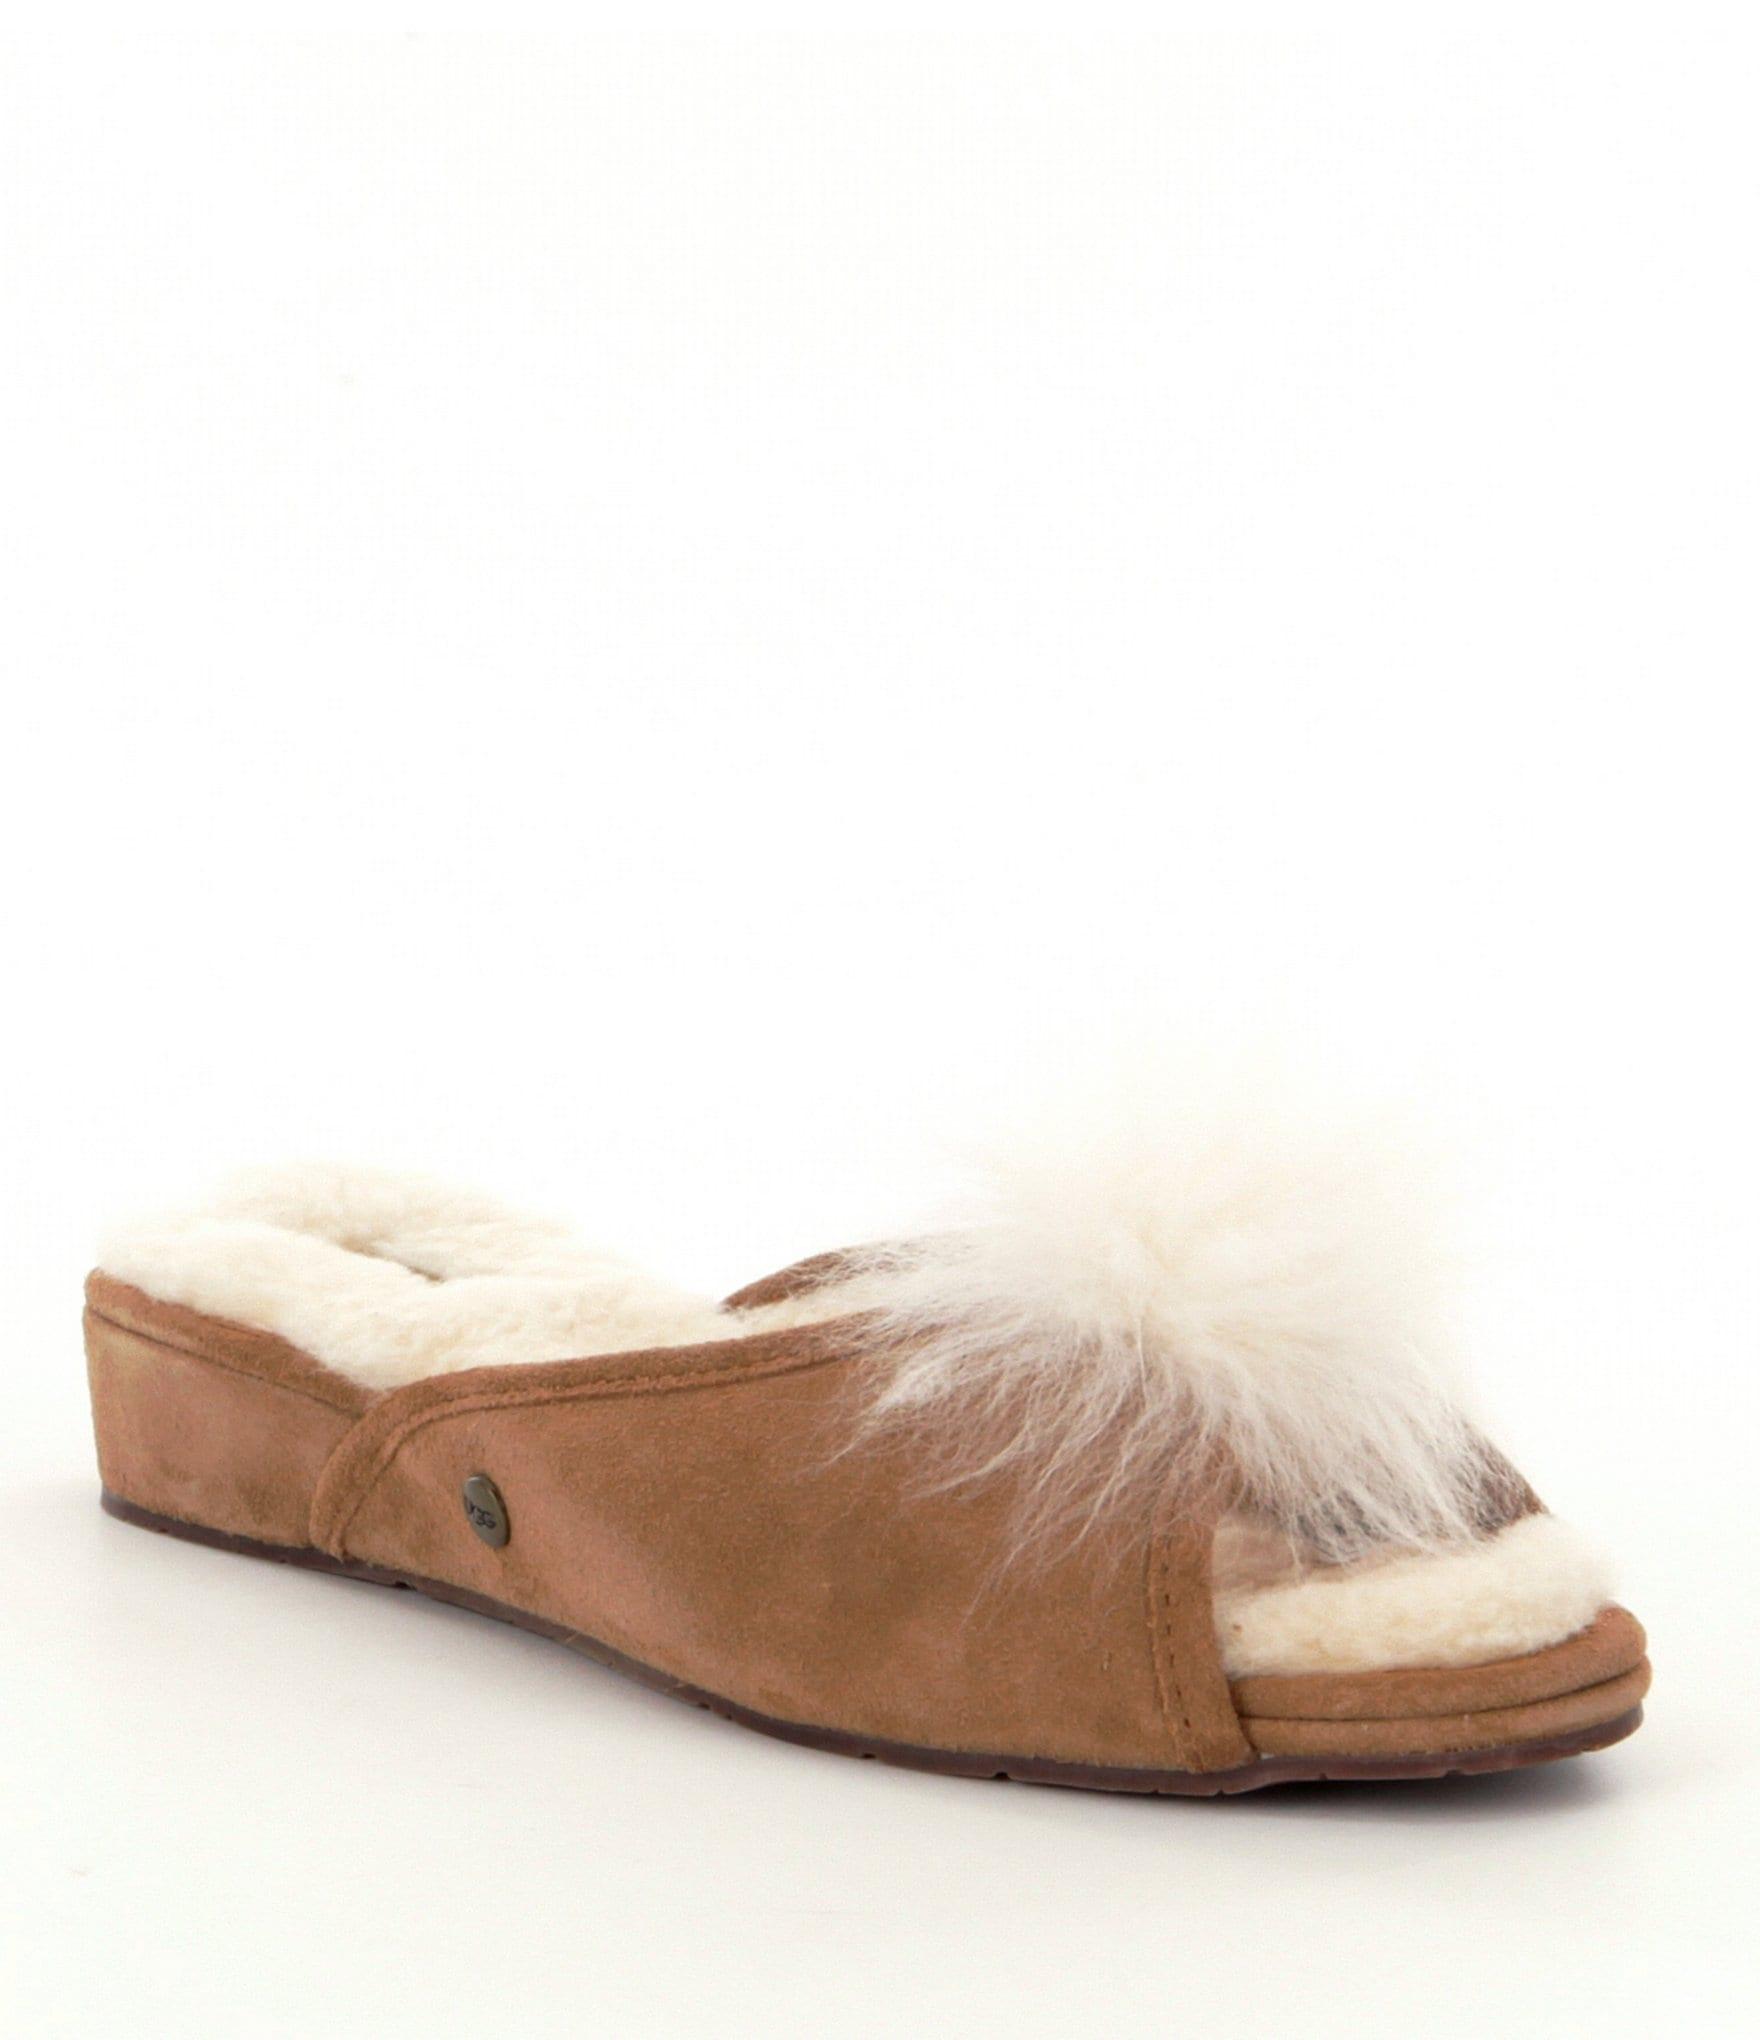 Ugg House Slippers Dillards